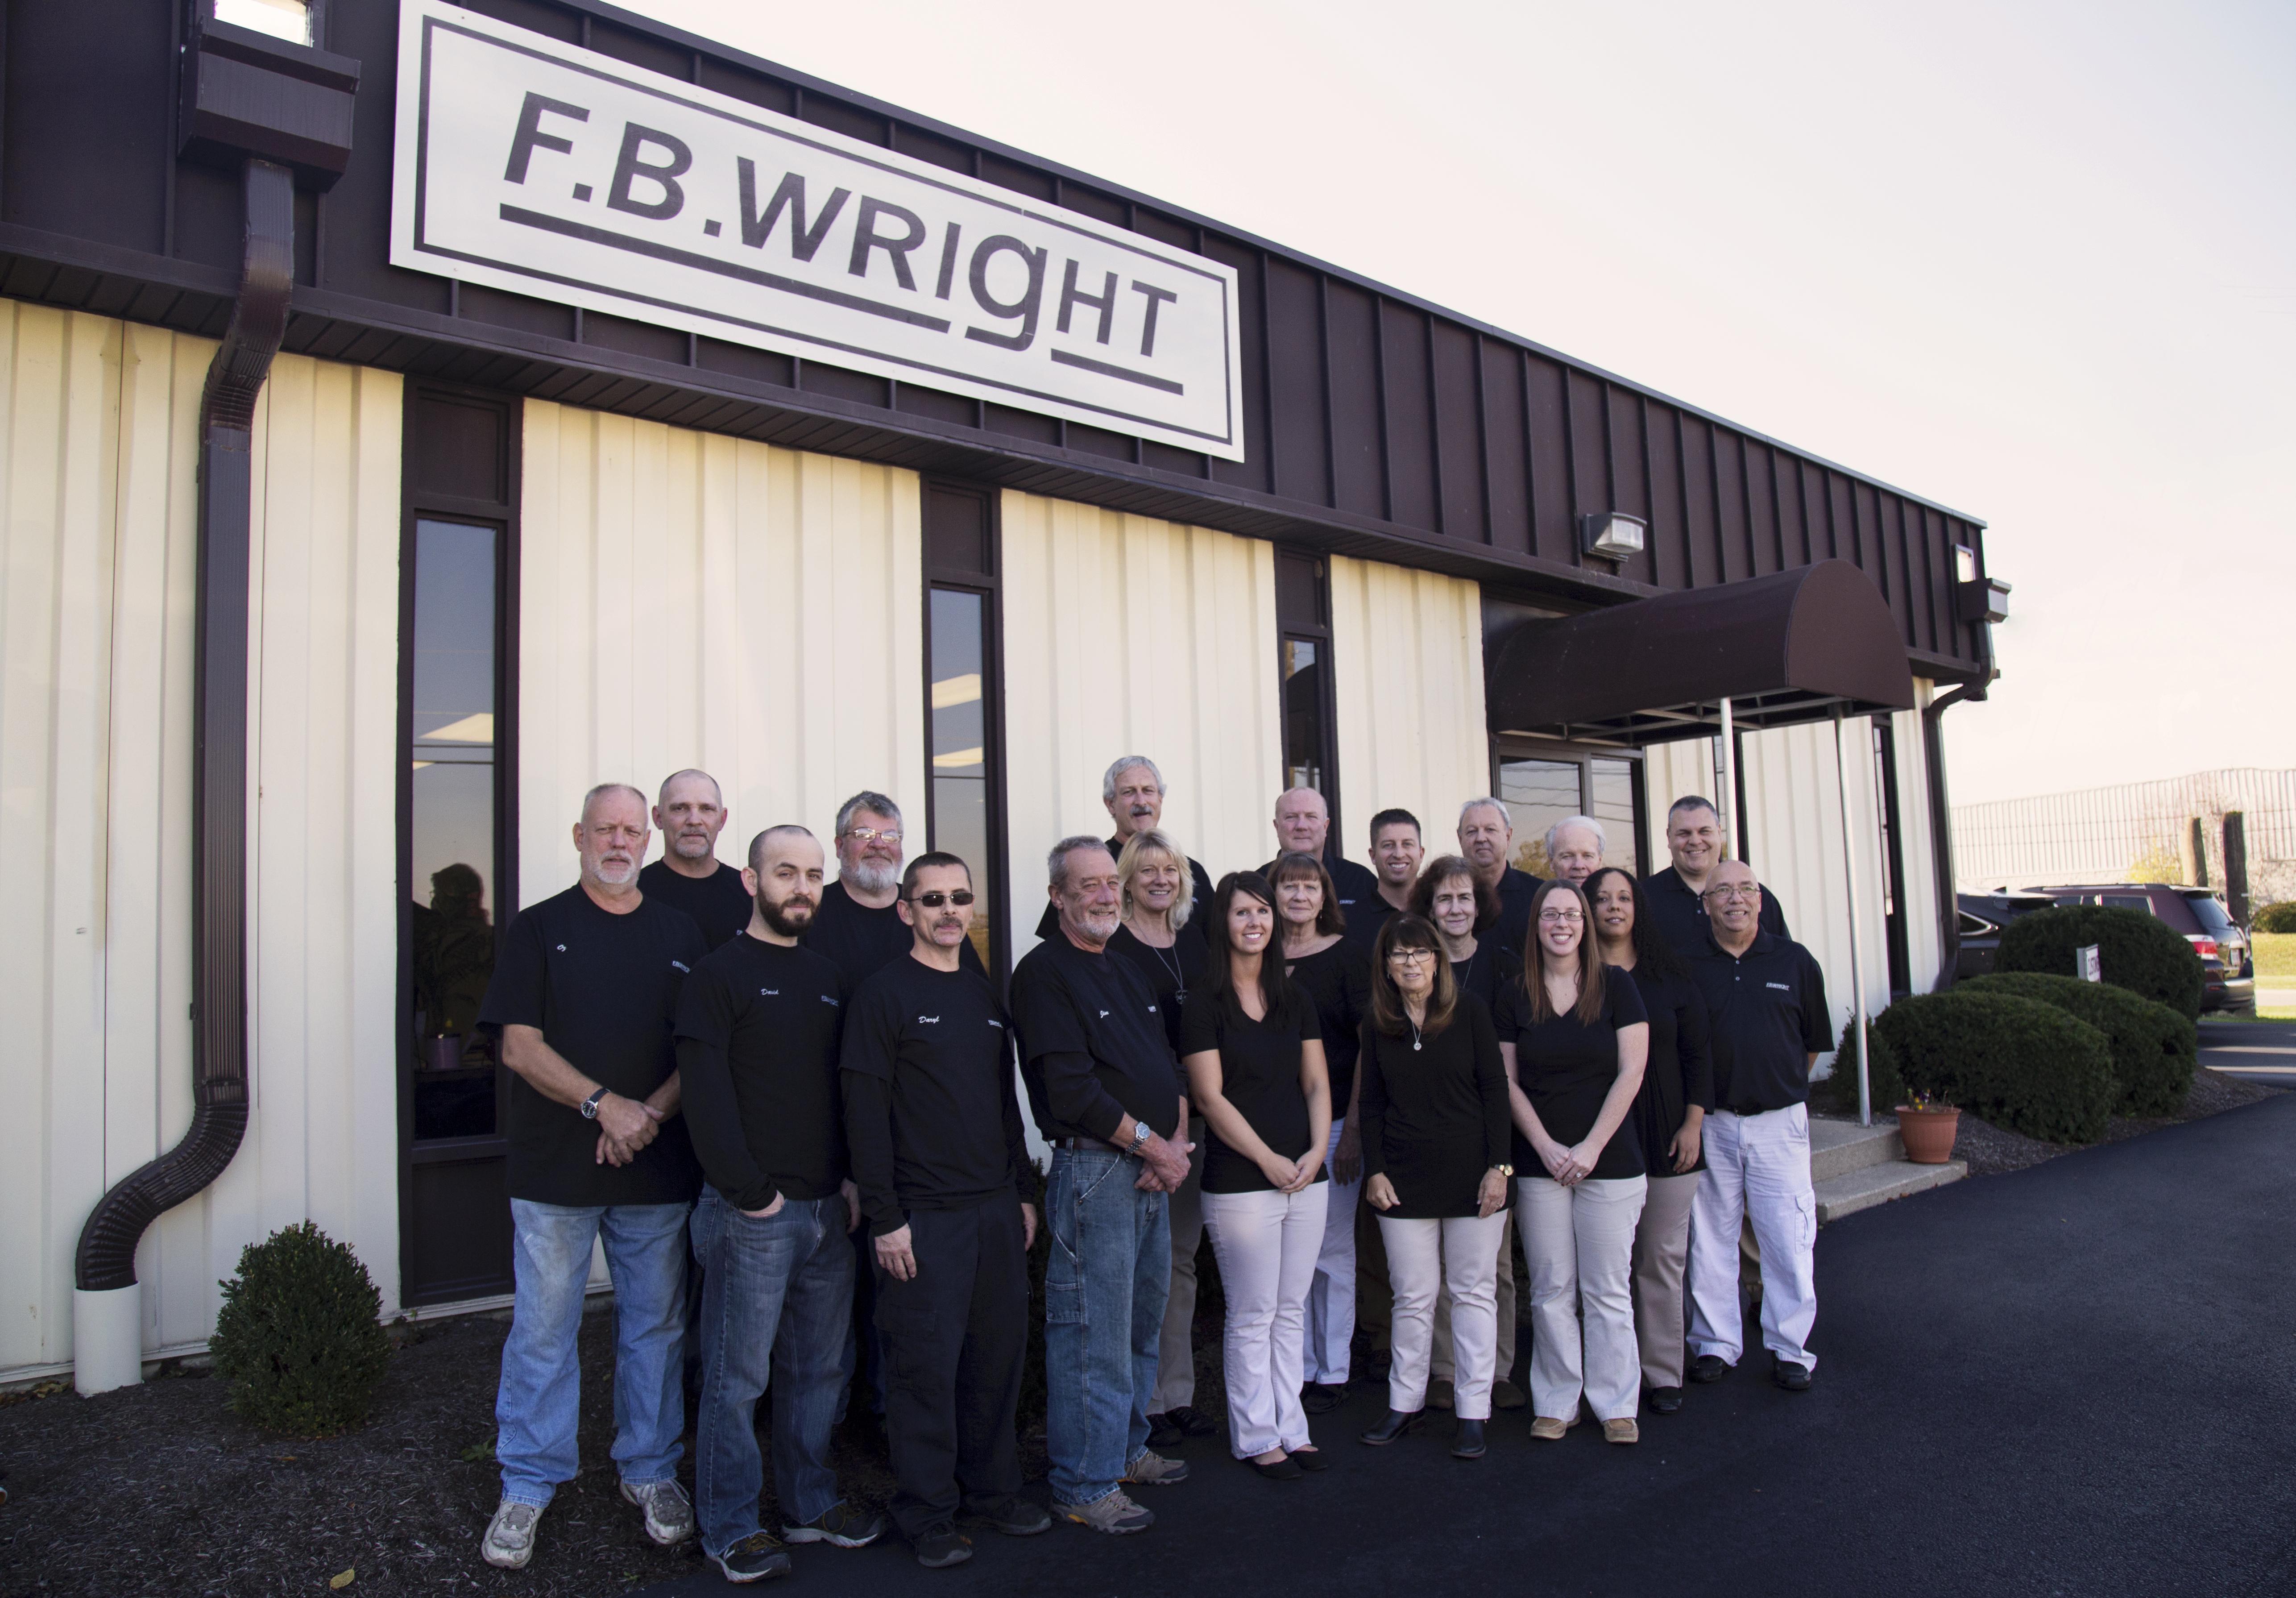 FB Wright Group Photo